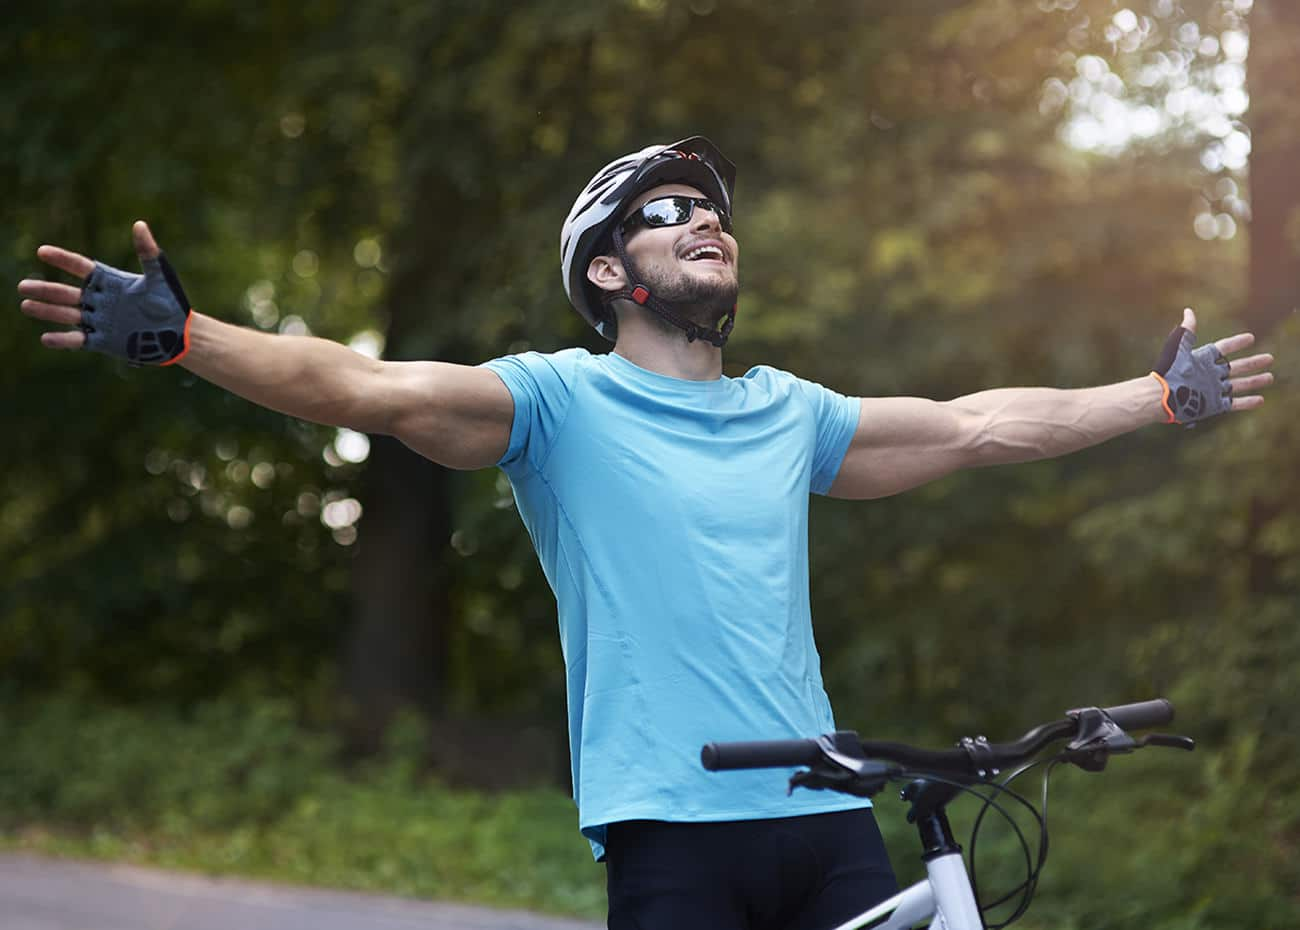 featured_bike